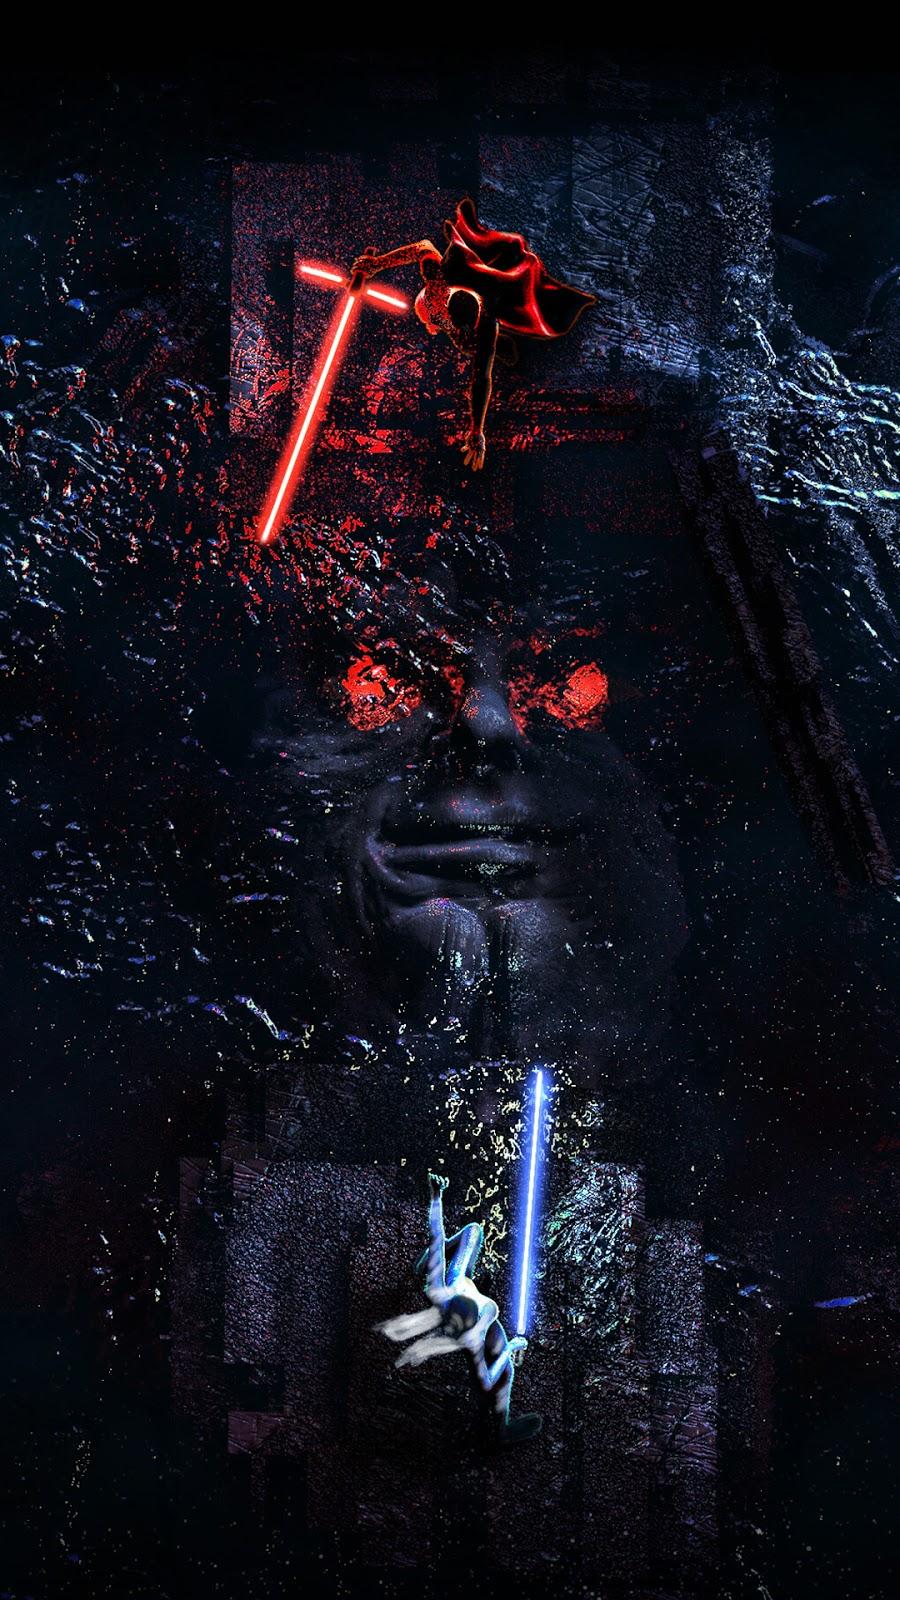 episode 9 star wars poster wallpaper